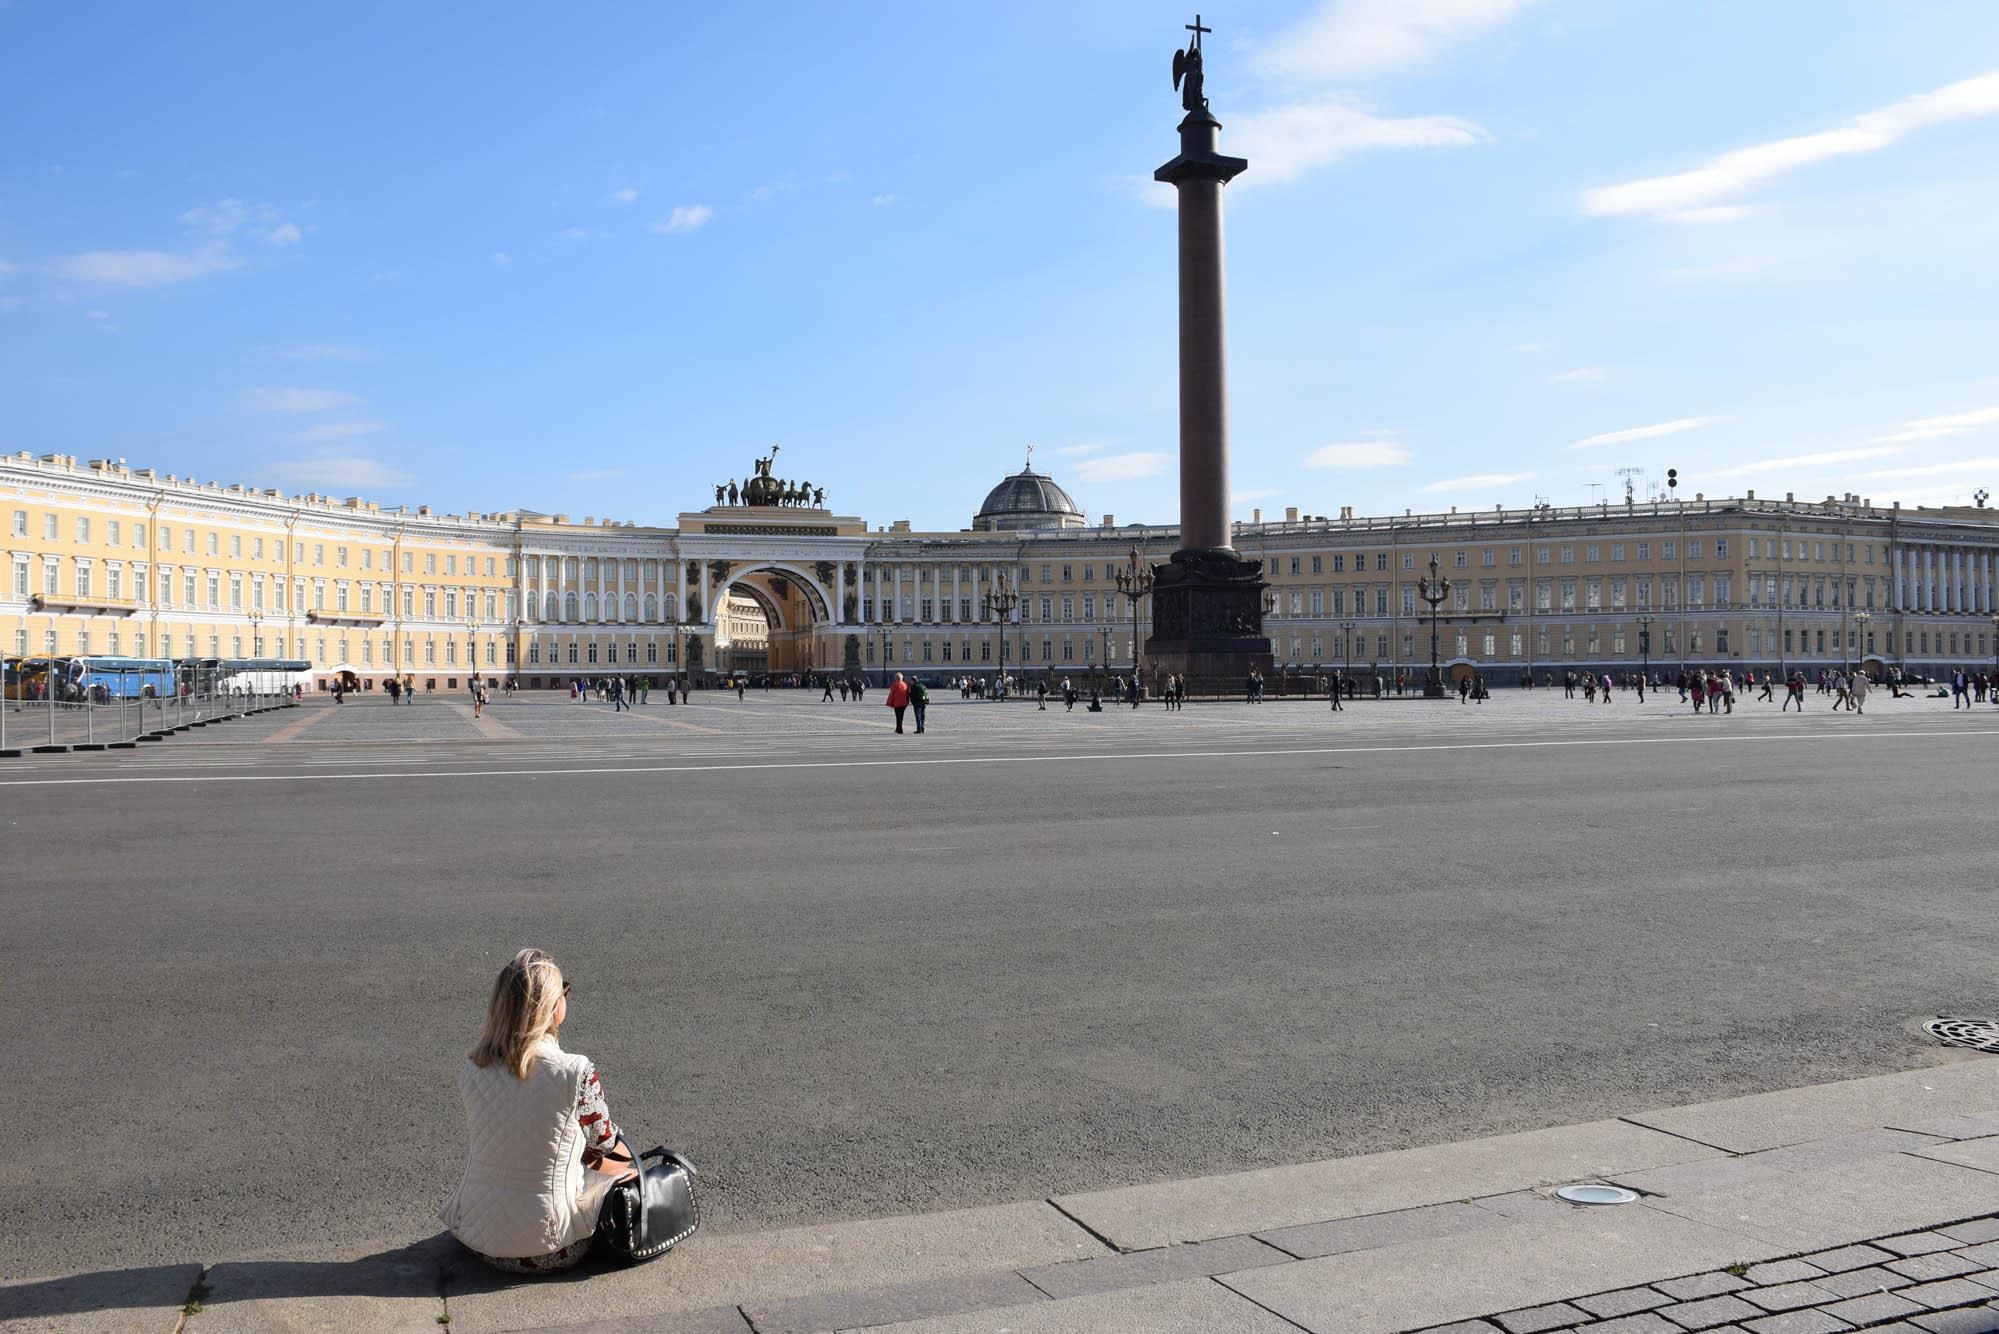 dicas de são petersburgo rússia lala rebelo palácio de inverno